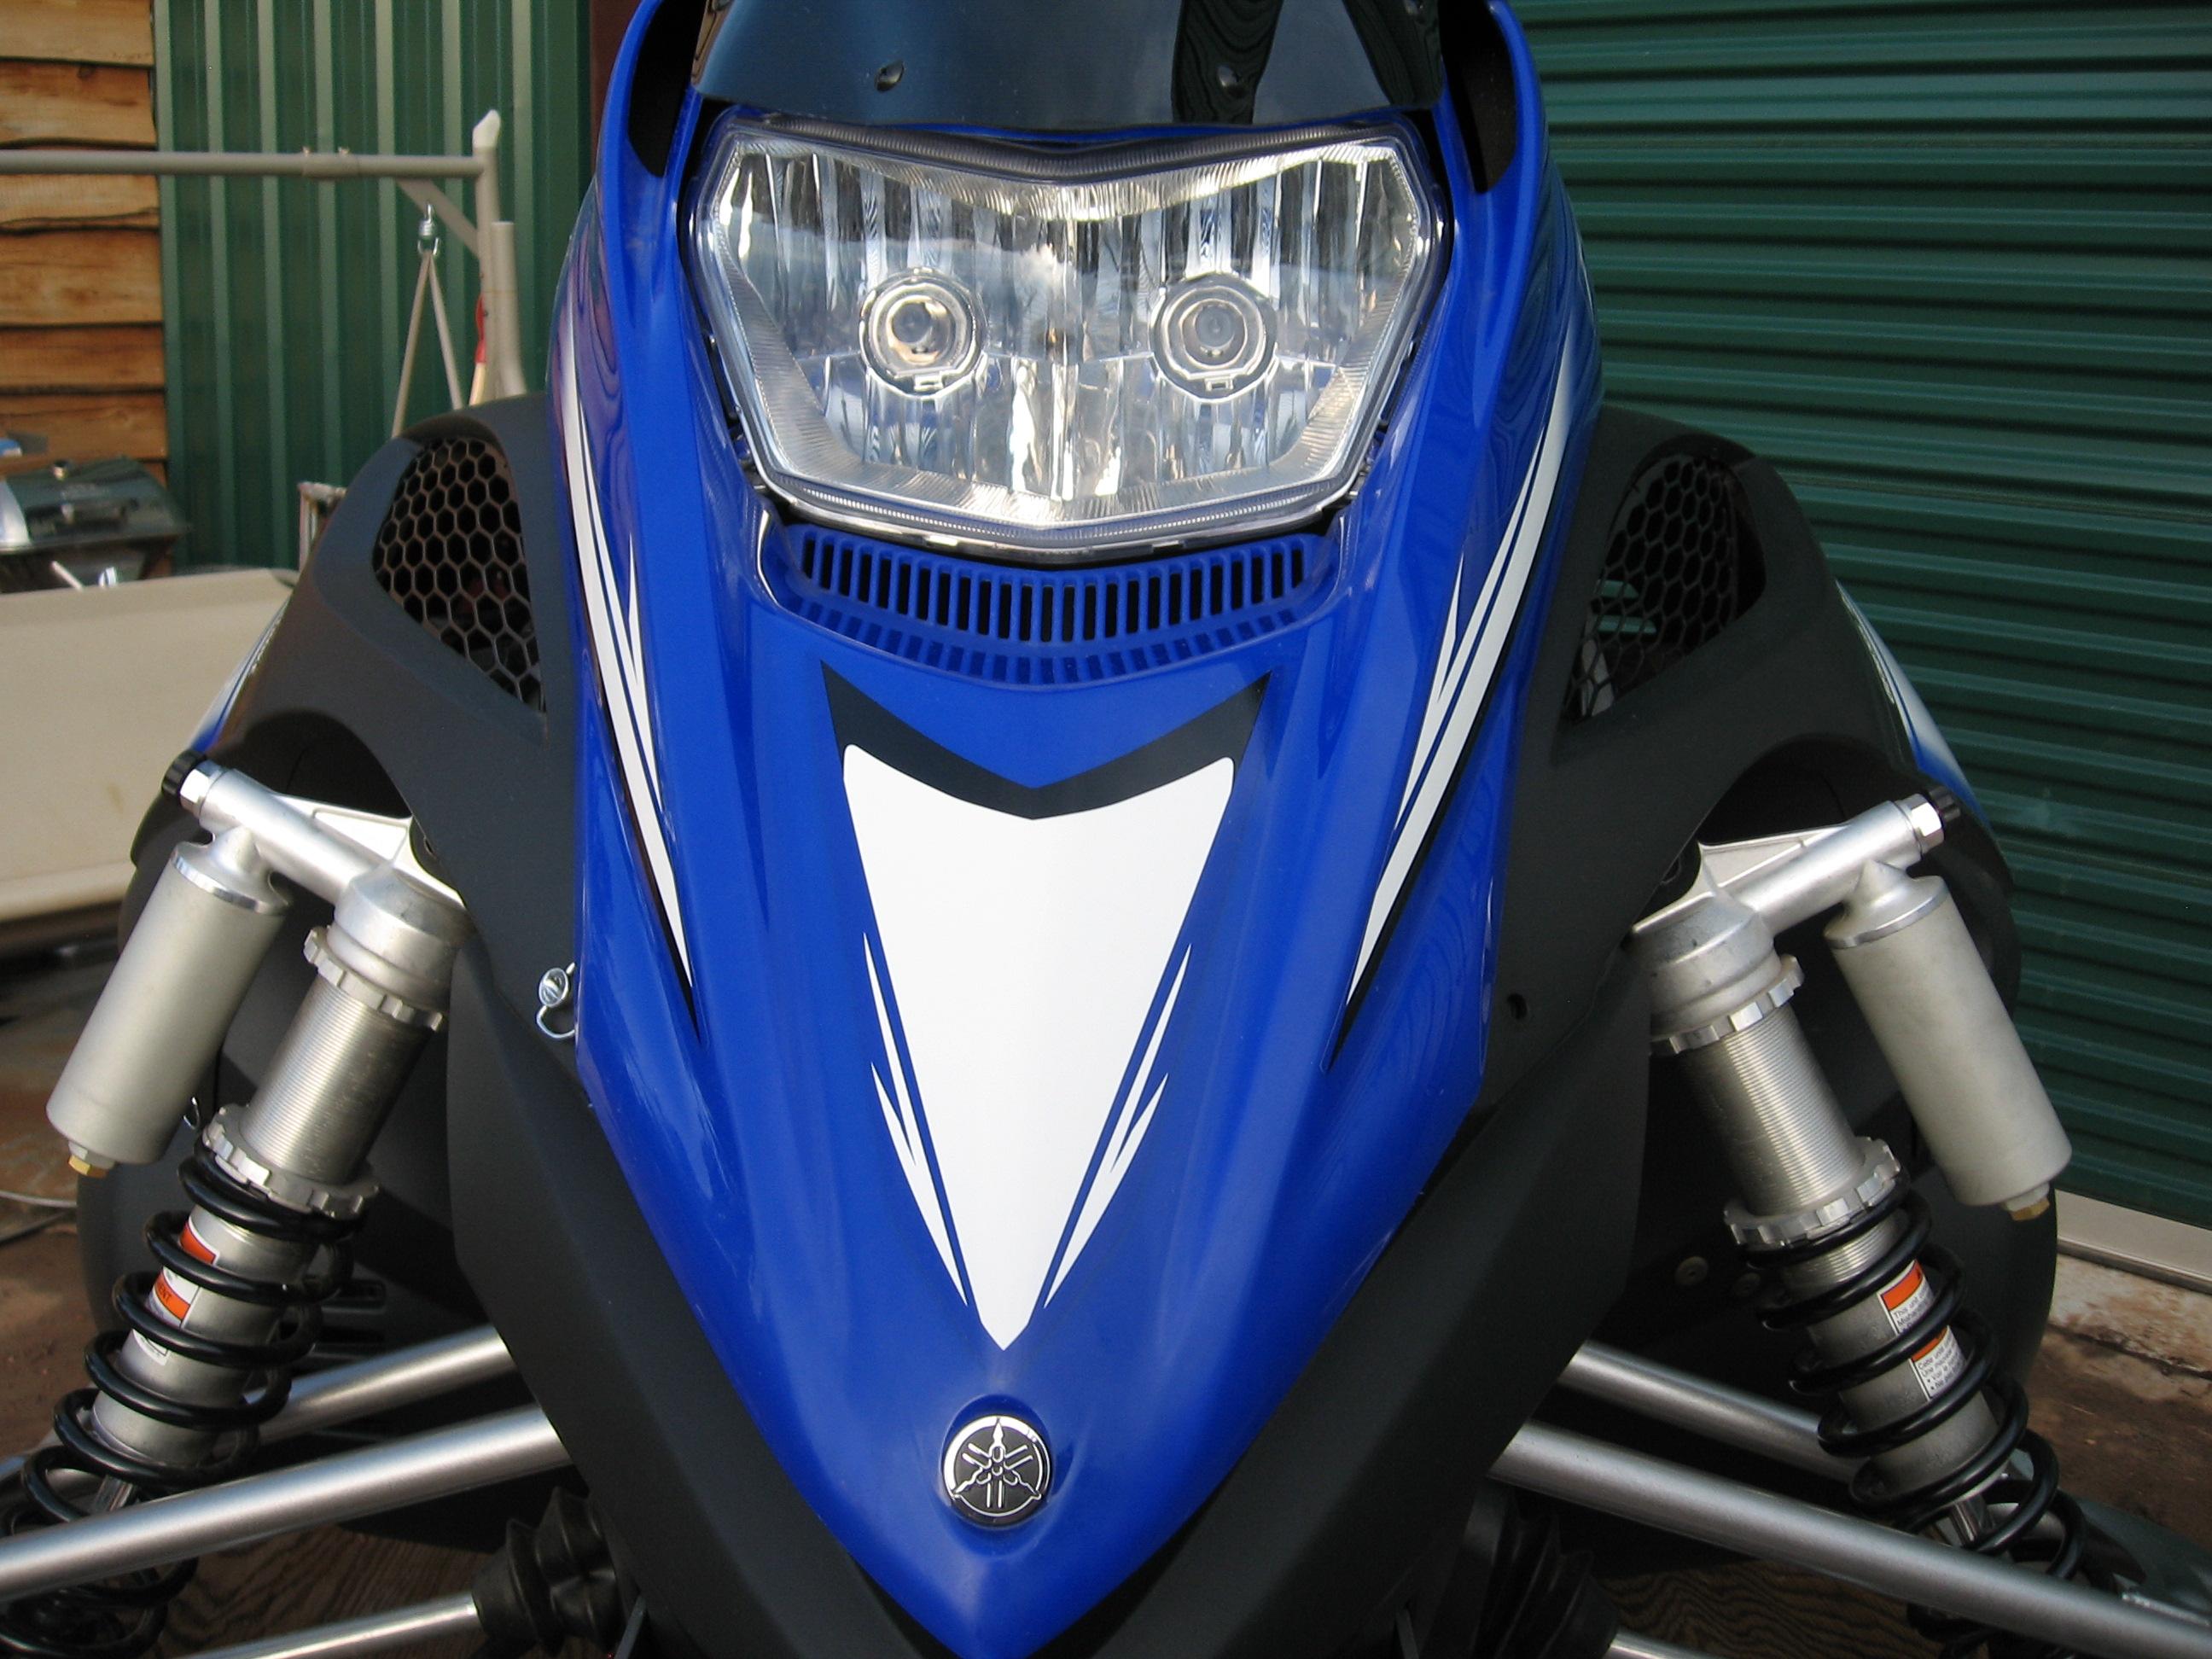 2009 Yamaha Fx Nytro Xtx